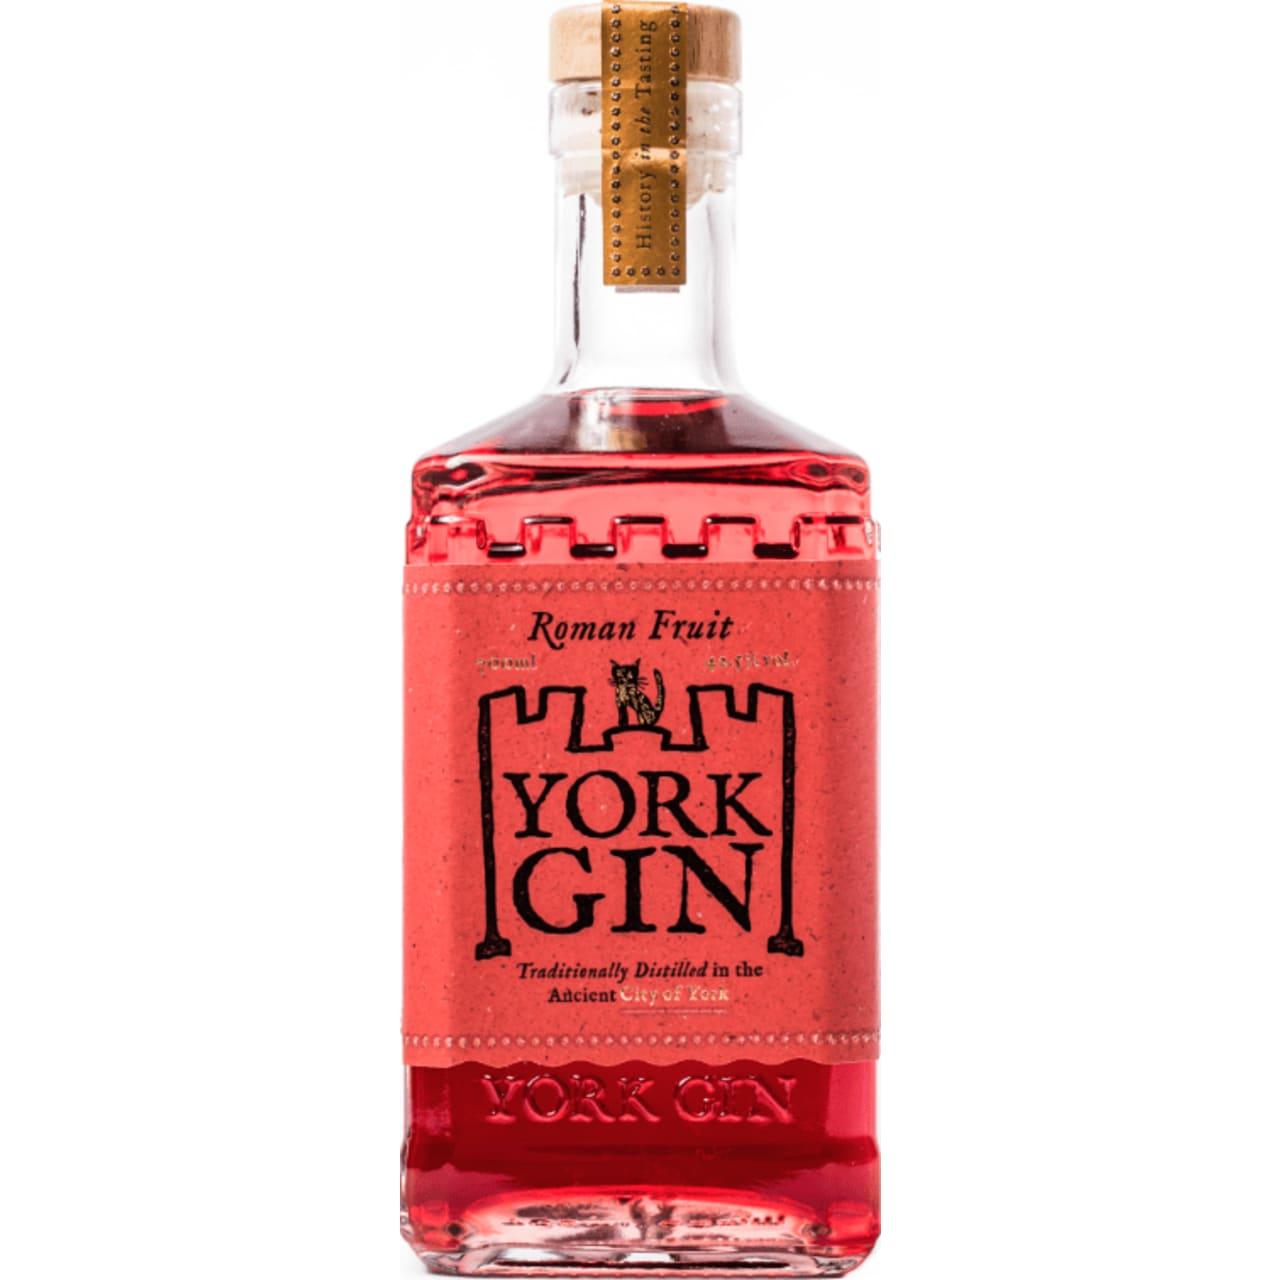 Product Image - York Gin Roman Fruit